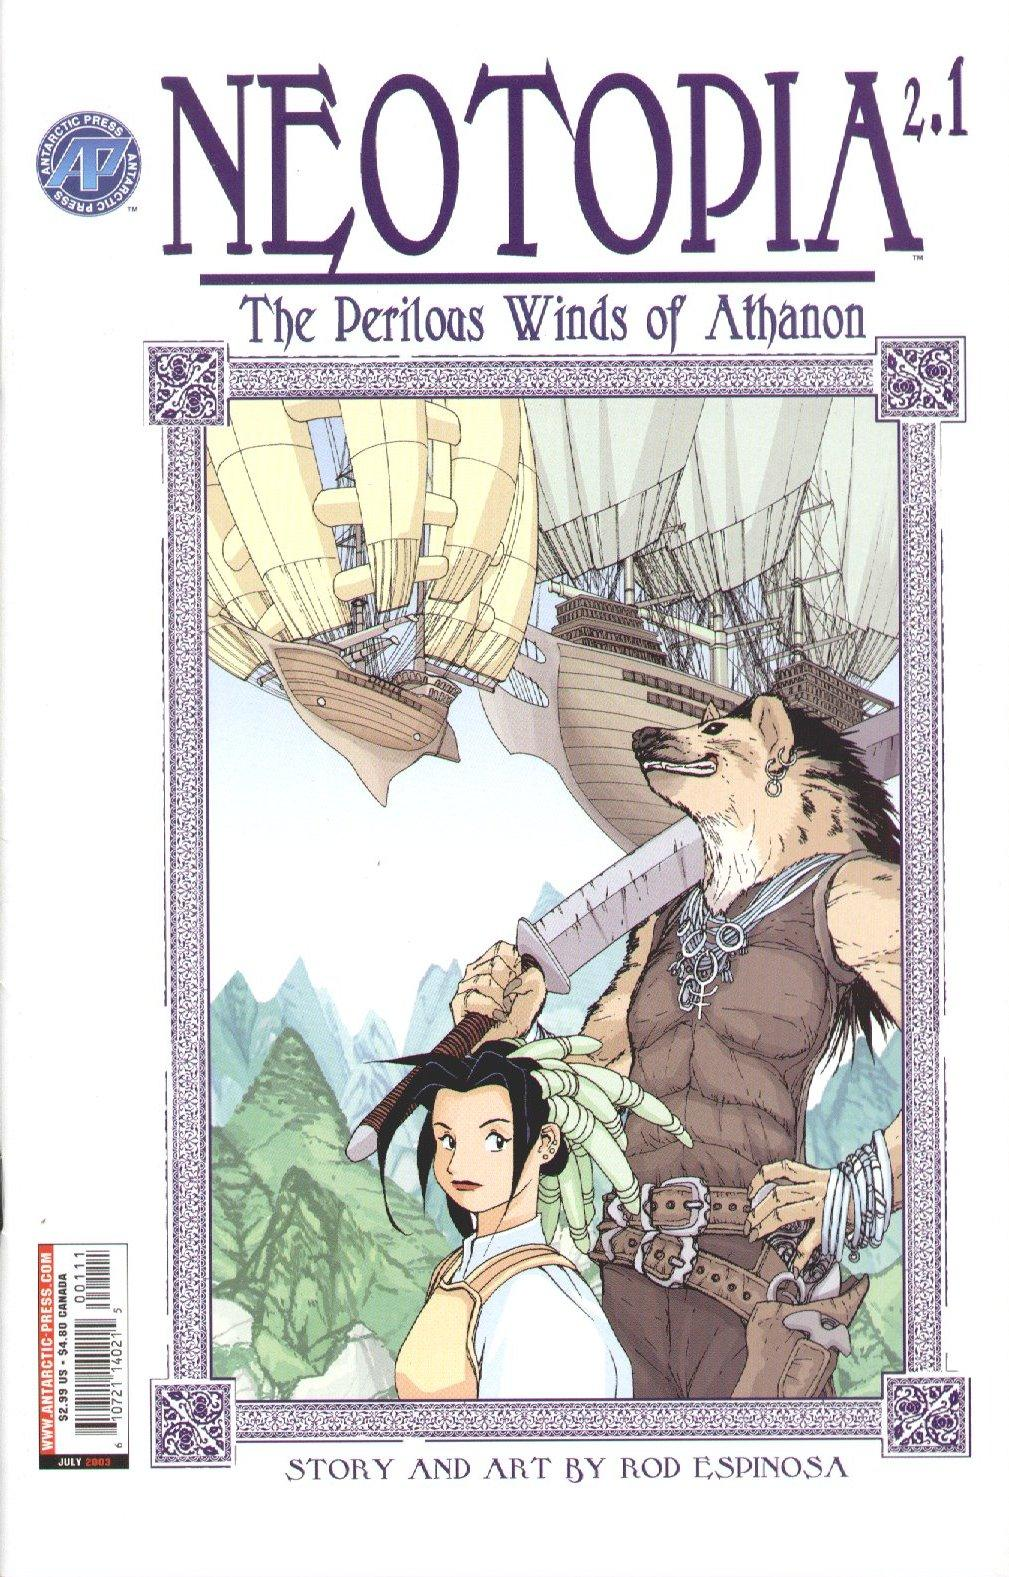 Neotopia v2 - The Perilous Winds of Athanon 001-005 (2003) Neotopia v2 01 (2003) (ed=c2c